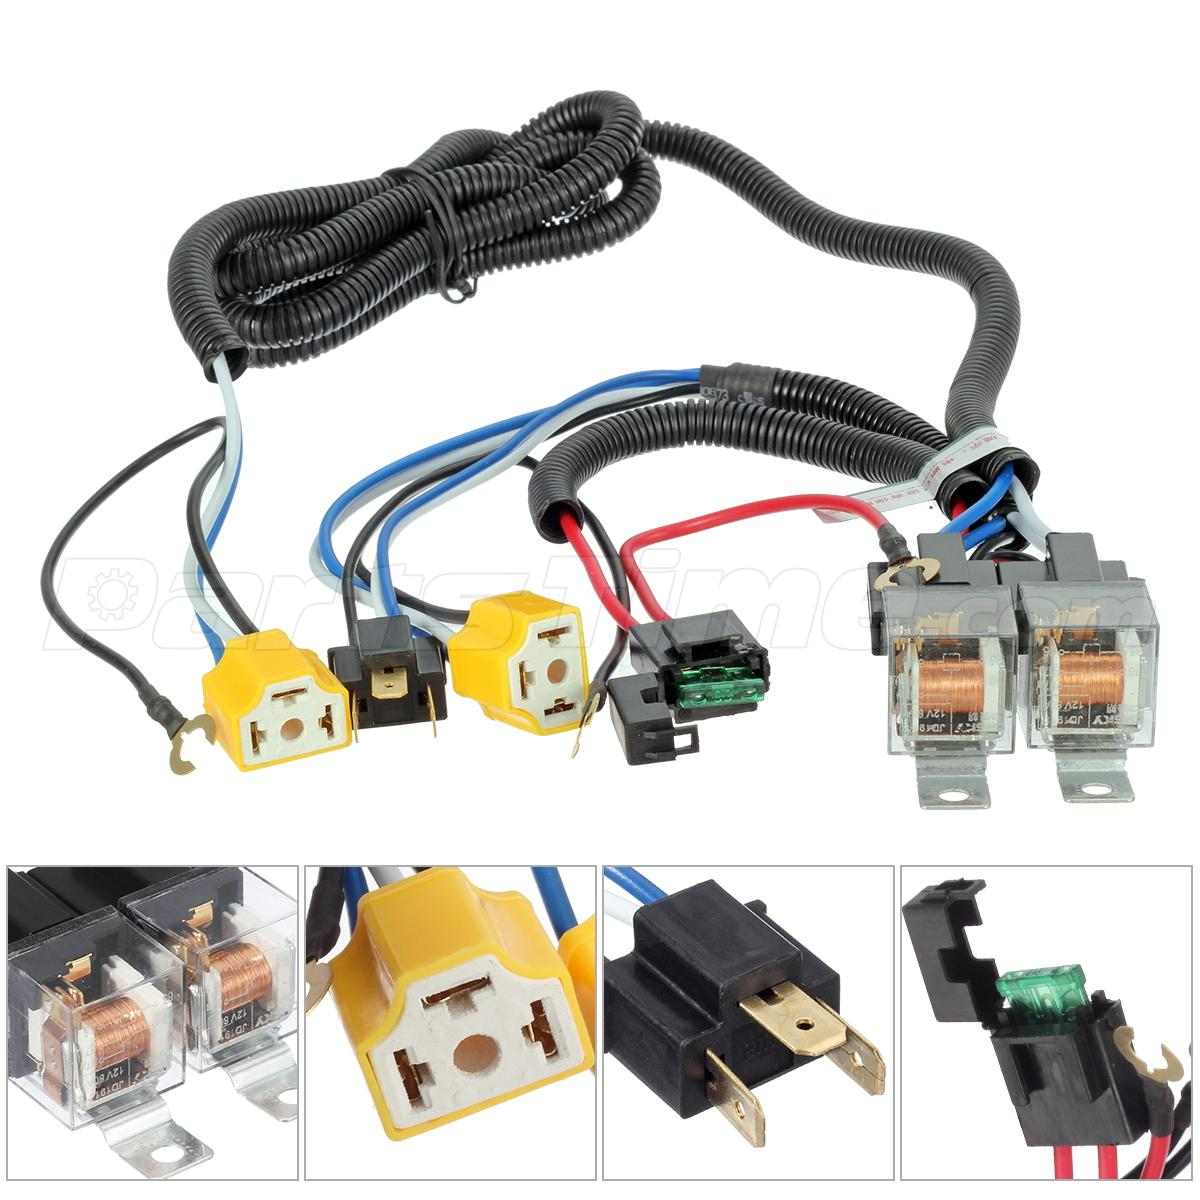 h4 halogen bulb wiring diagram pontoon boat ceramic headlight headlamp light relay